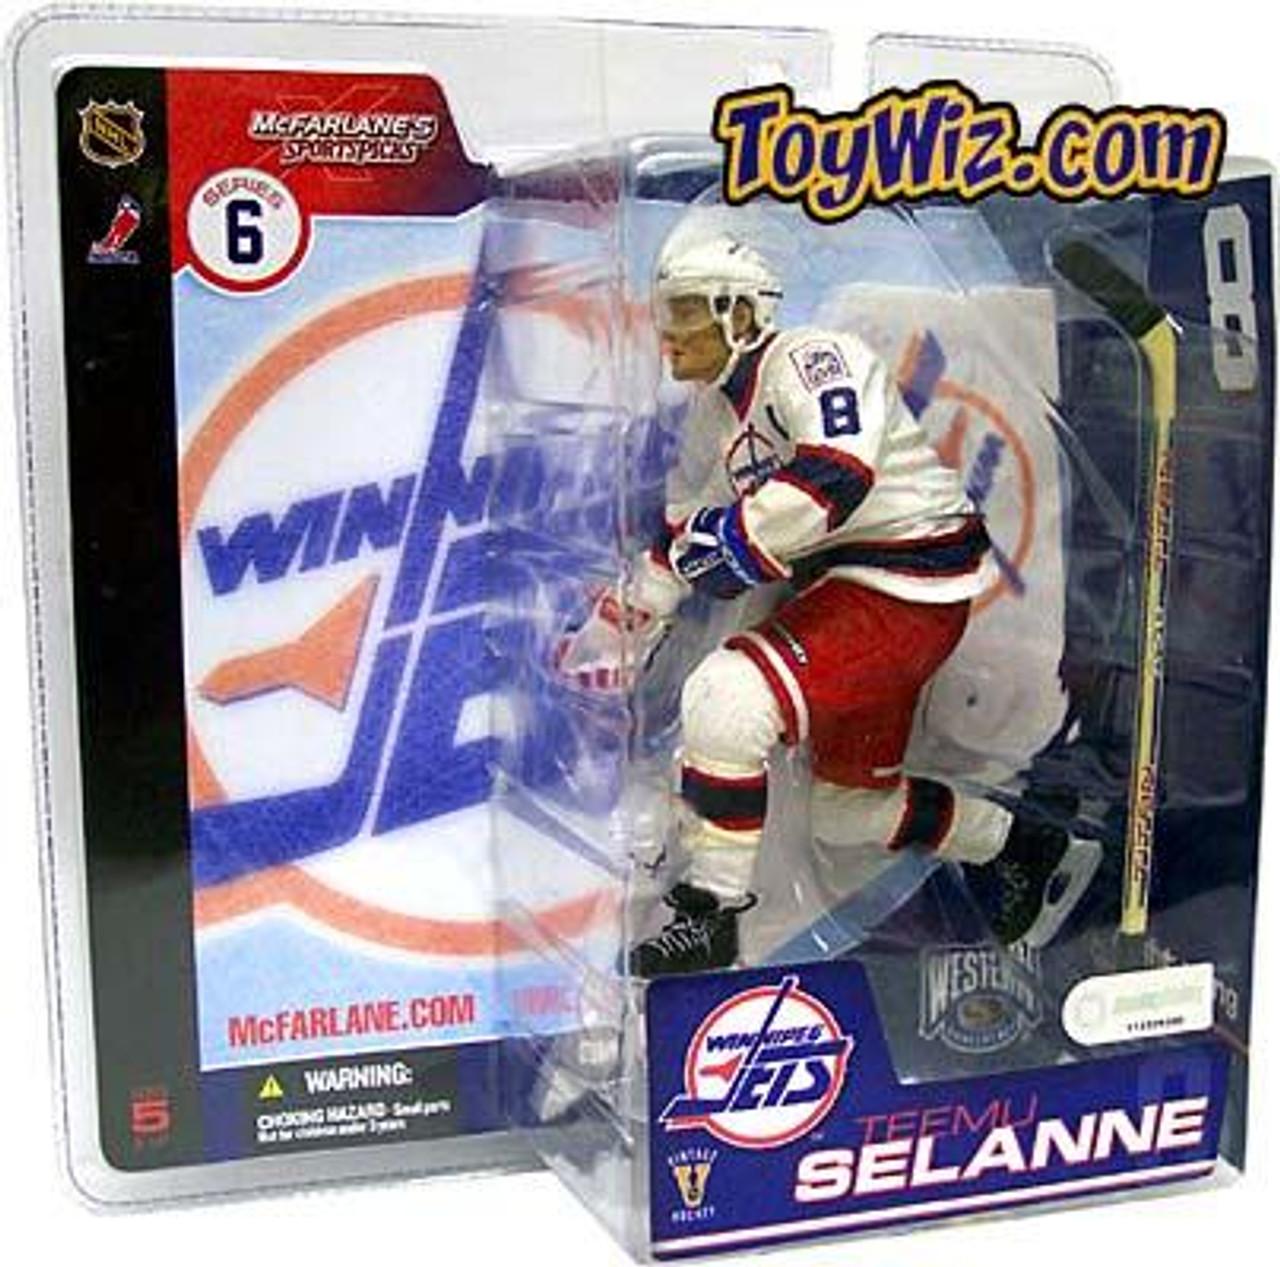 McFarlane Toys NHL Winnipeg Jets Sports Picks Series 6 Teemu Selanne Action Figure [Winnepeg Jets]